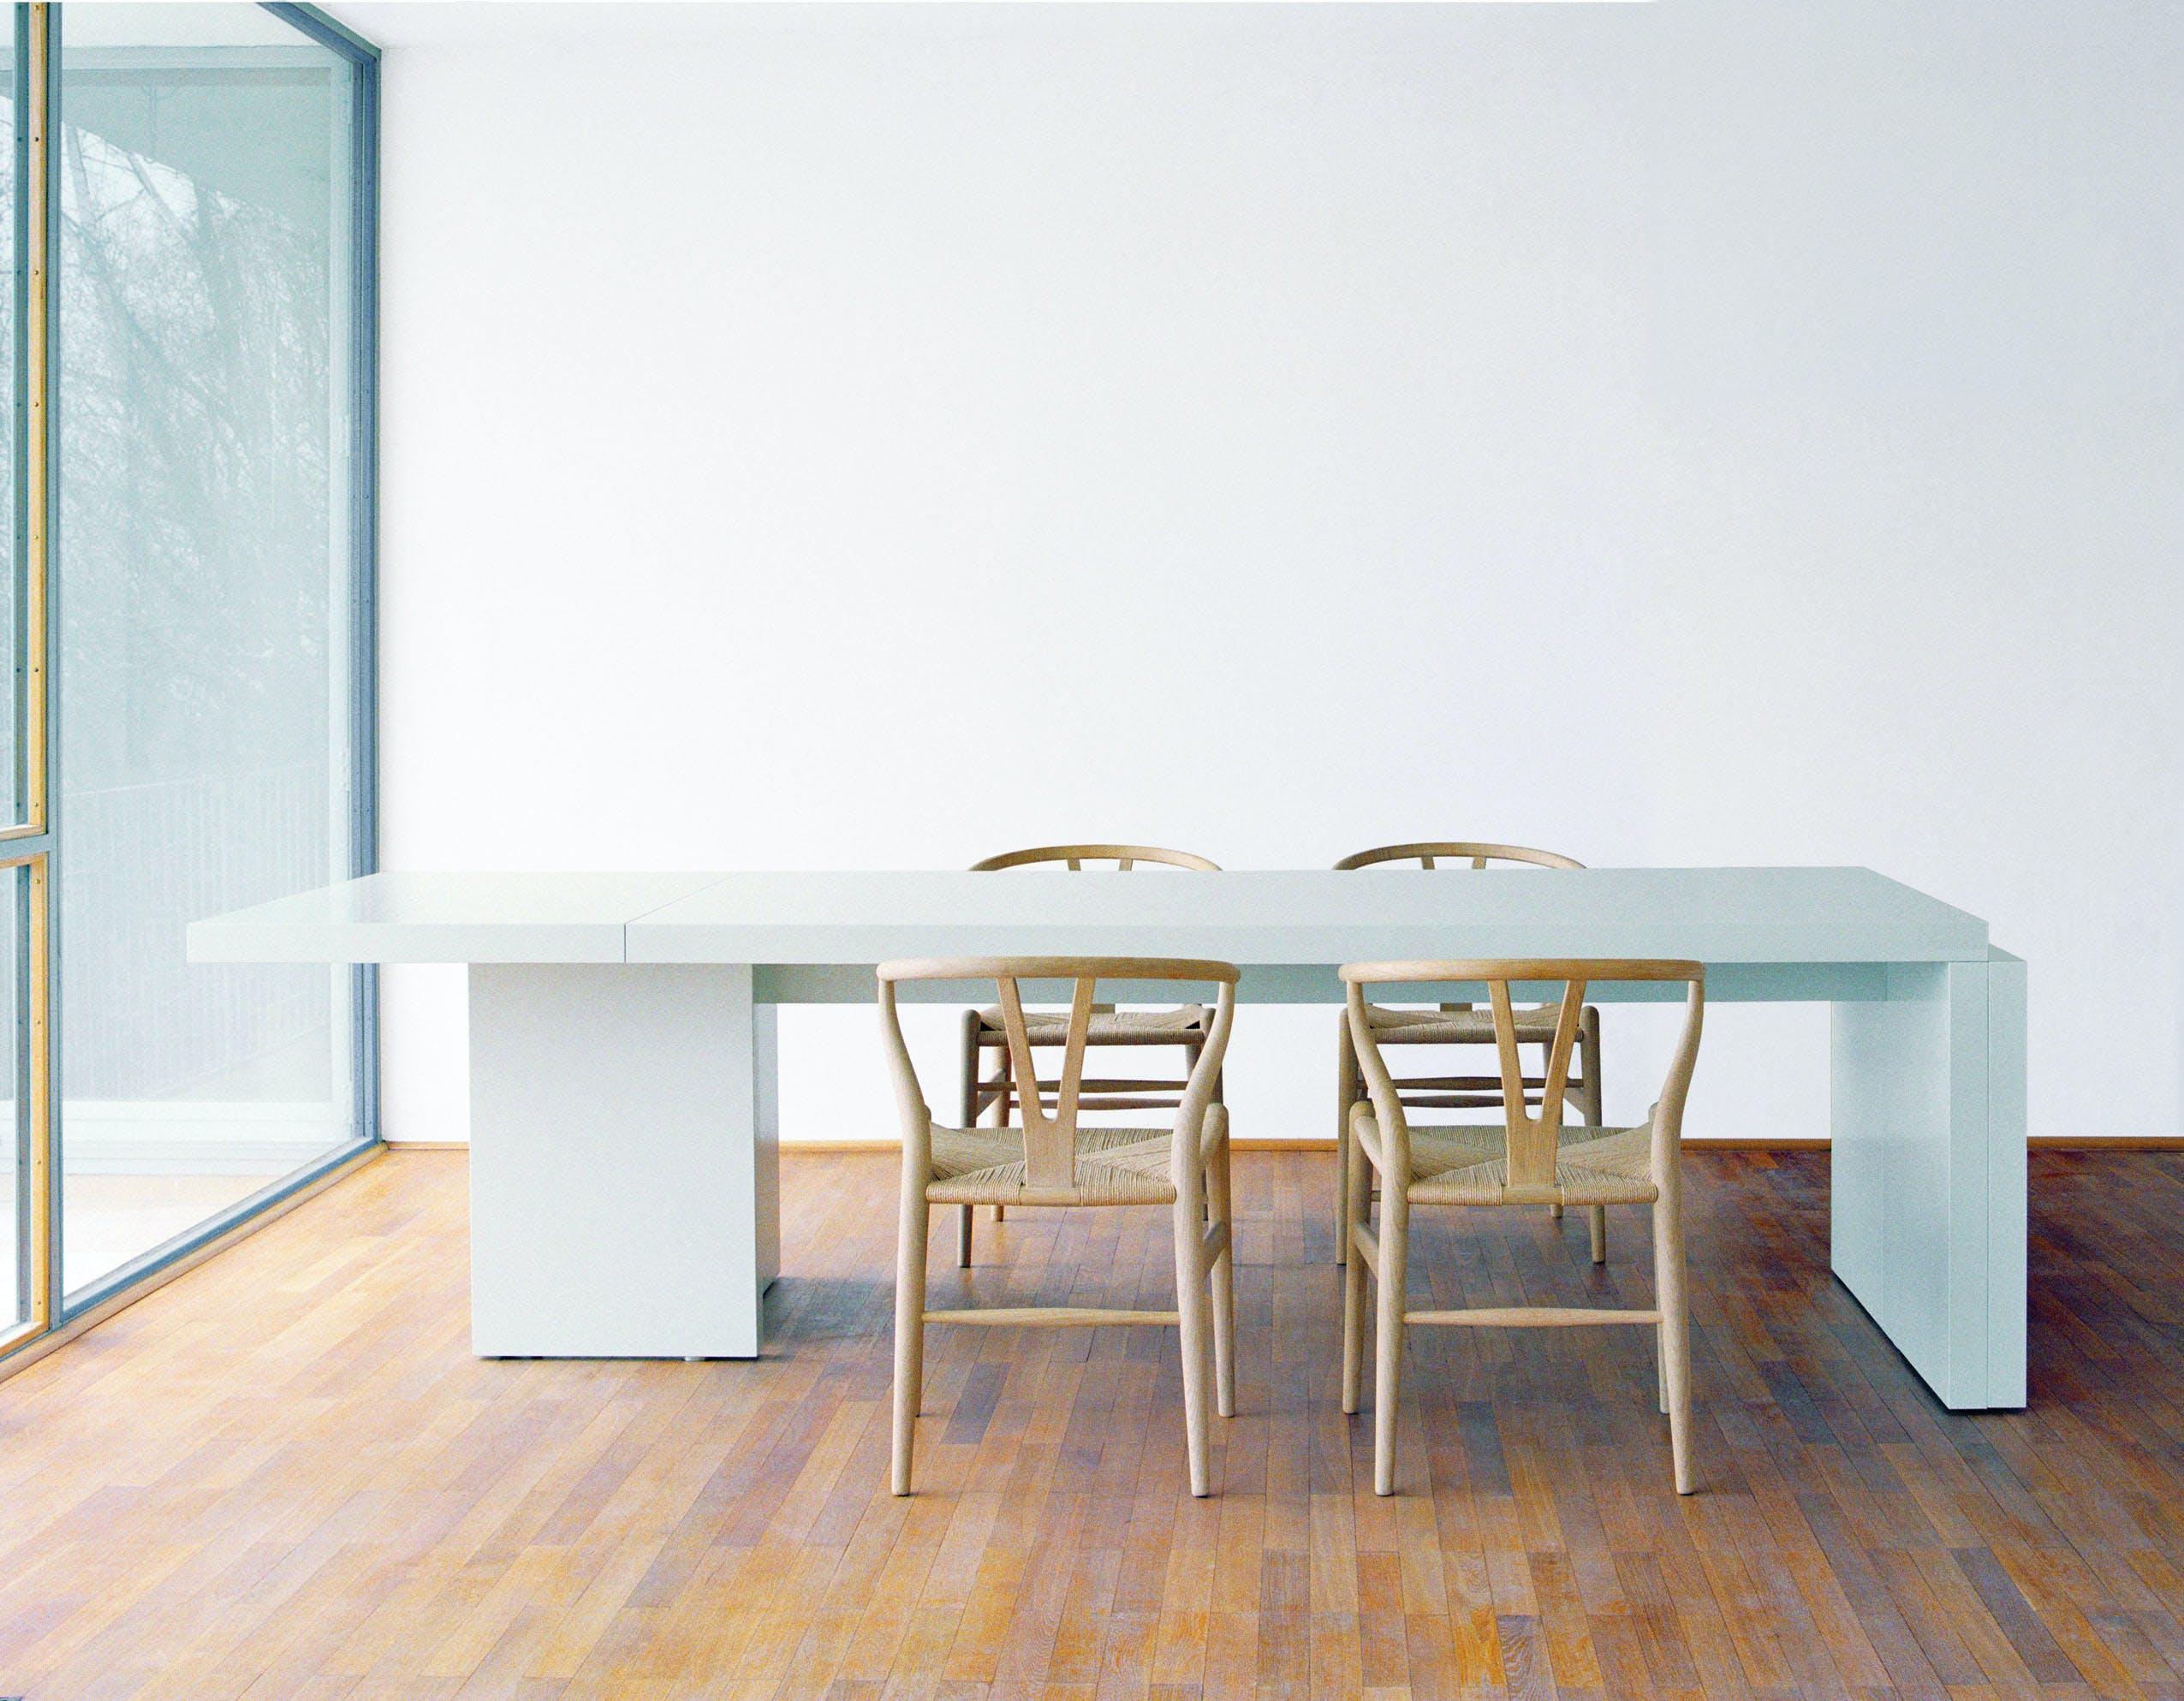 E15-furniture-isaac-table-window-2-haute-living